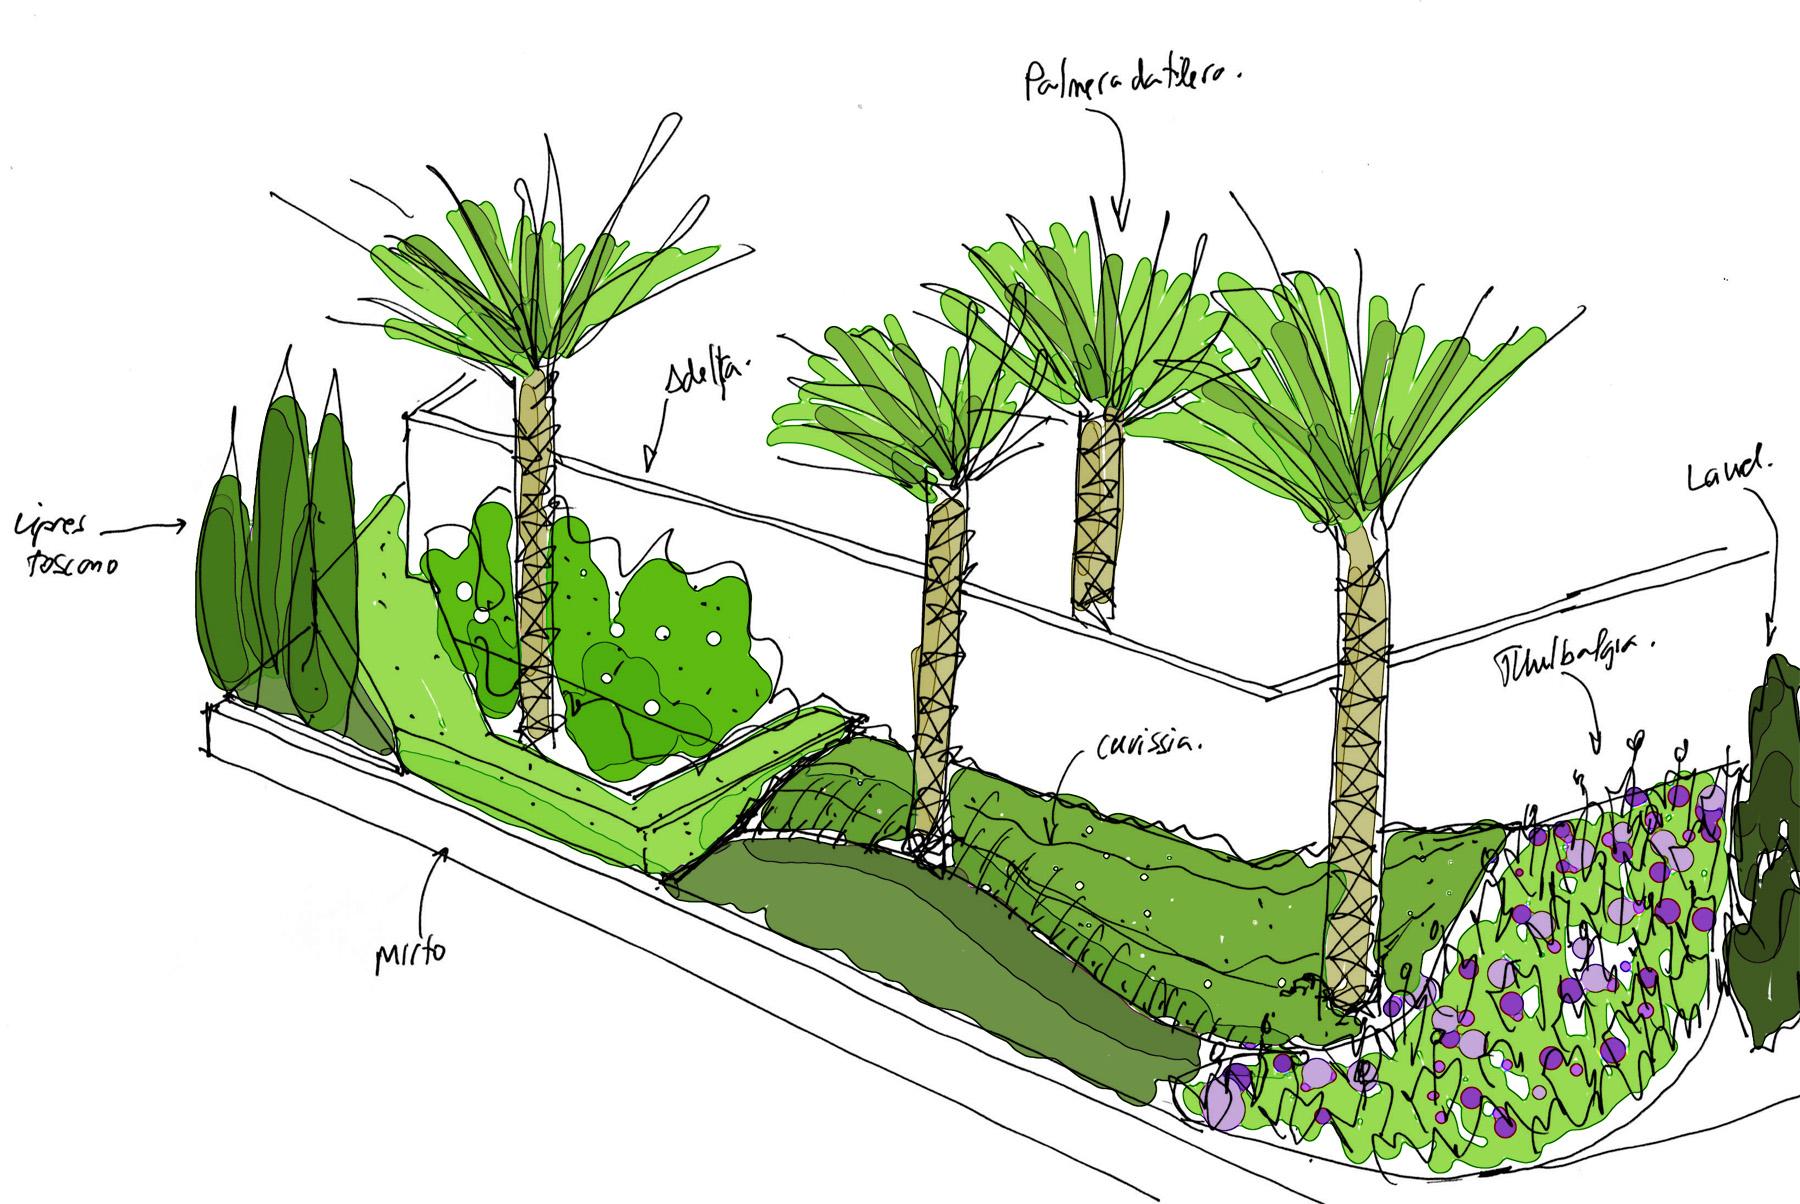 Claves para dise ar un jard n i david jim nez - El jardin mediterraneo ...